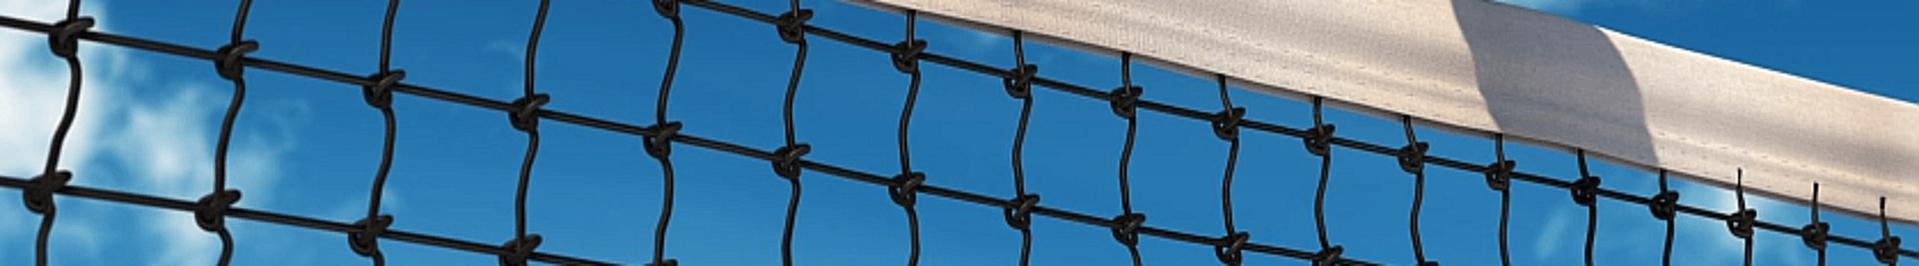 04-tennisnet-1919xx266px-v4